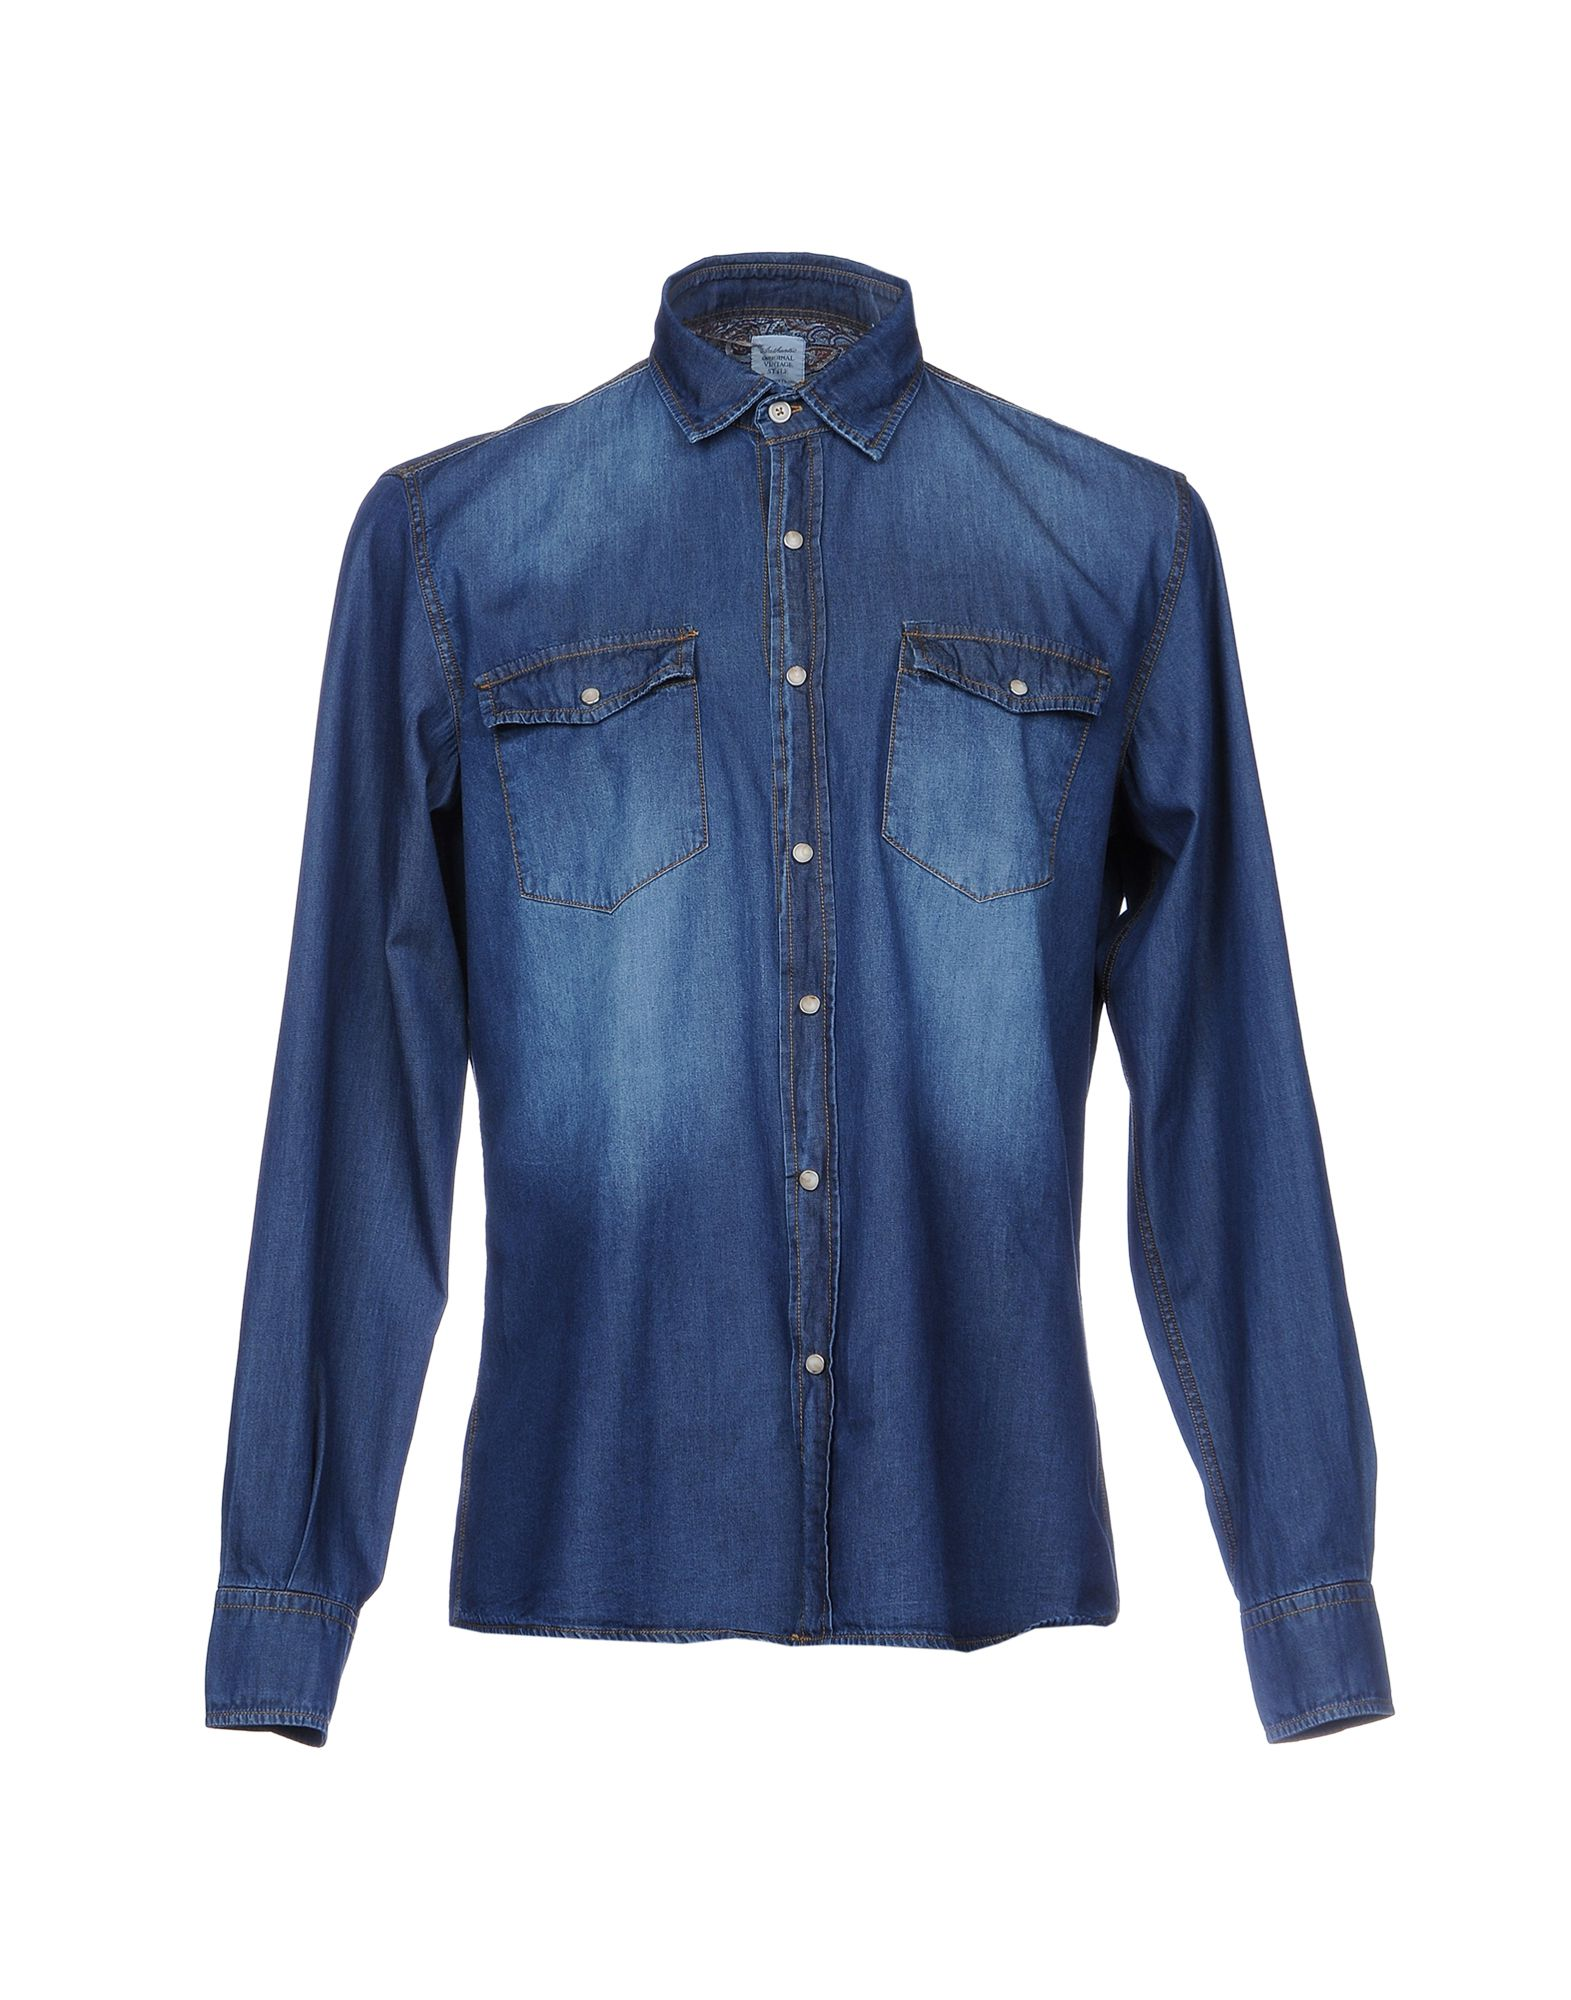 AUTHENTIC ORIGINAL VINTAGE STYLE Джинсовая рубашка new japanese original authentic vfr3140 5ezc